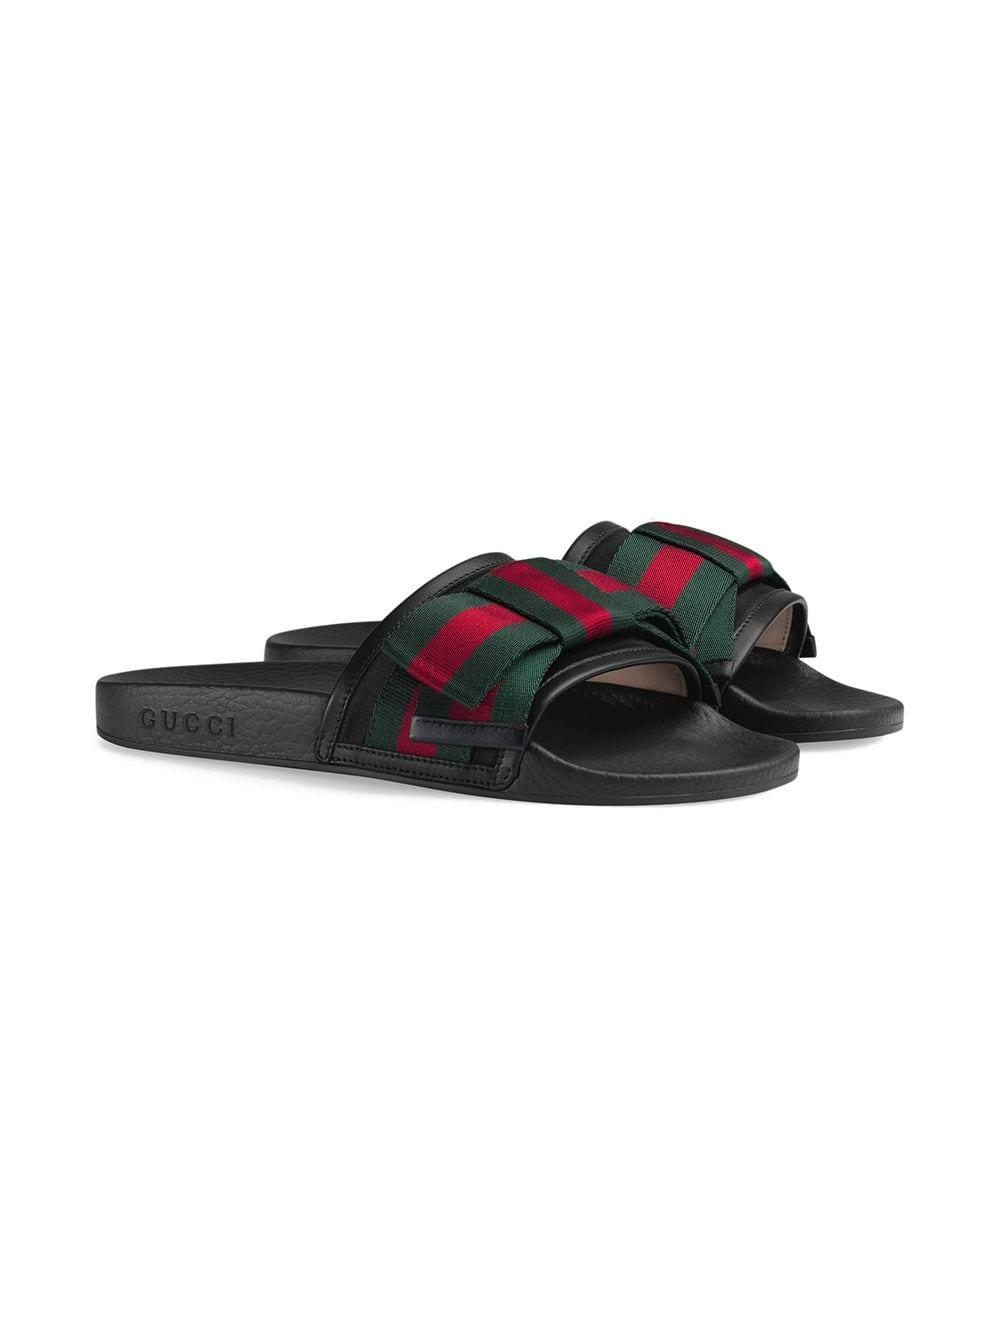 2e3ed61dba0 Gucci - Black Pursuit Cotton And Leather Ribbon Bow Flat Slides - Lyst.  View fullscreen